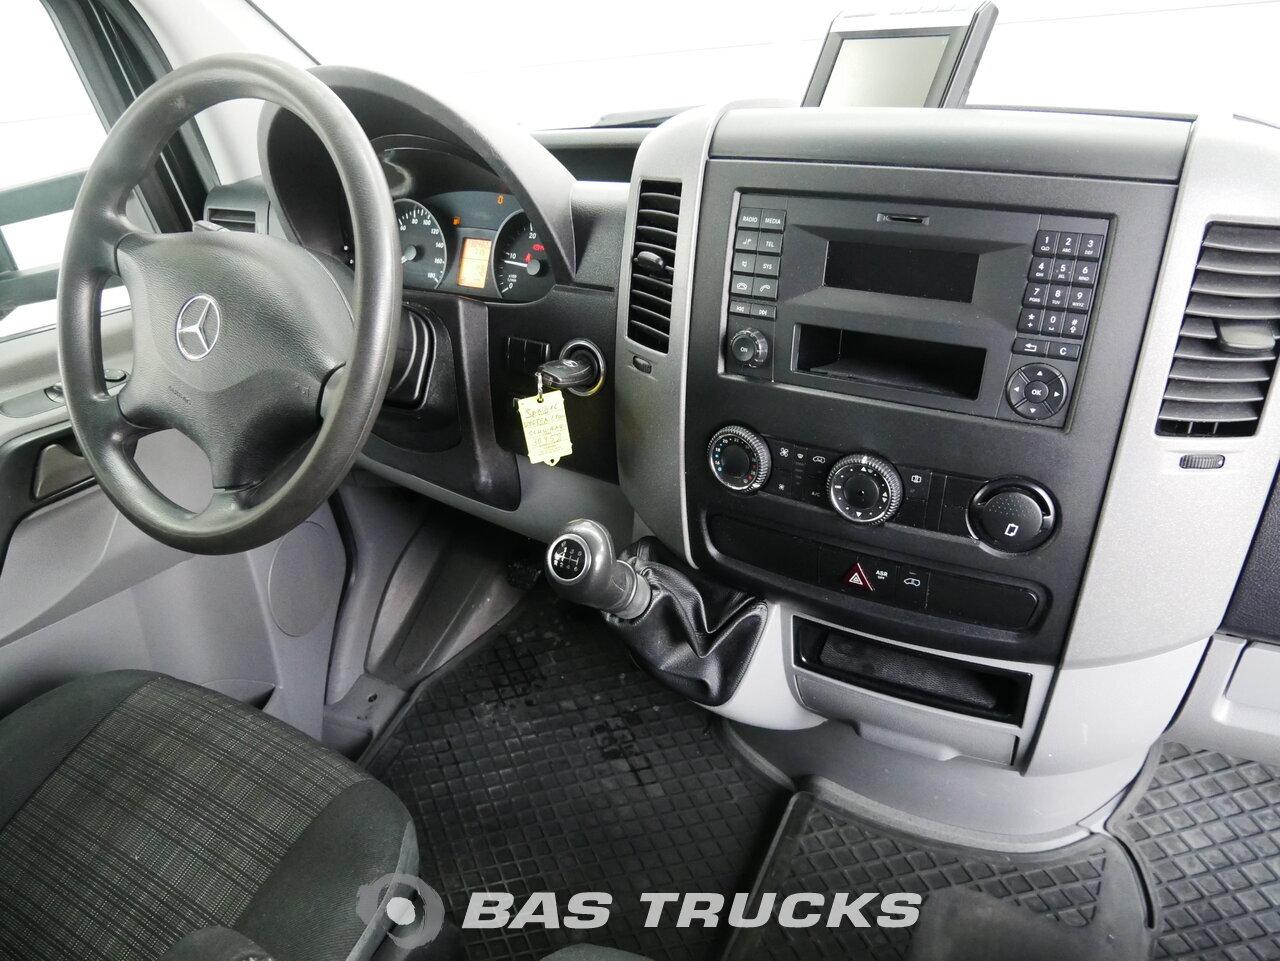 снимка на употребяван минибус Mercedes Sprinter 2013